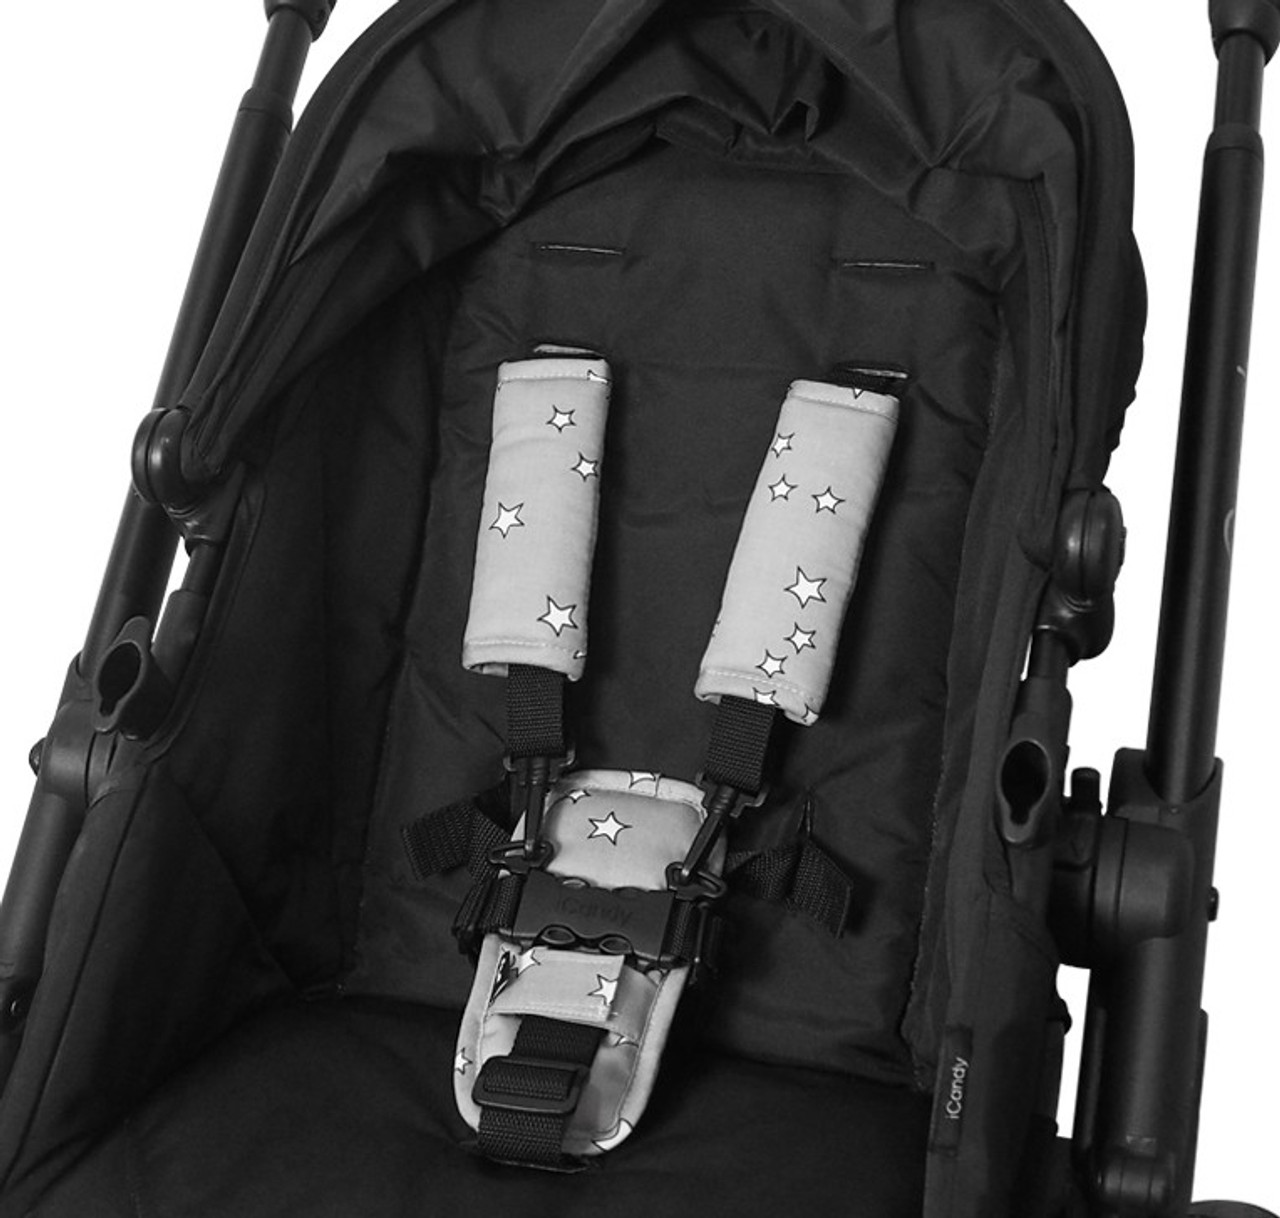 Outlook Pram Harness Cover Set - GREY STARS